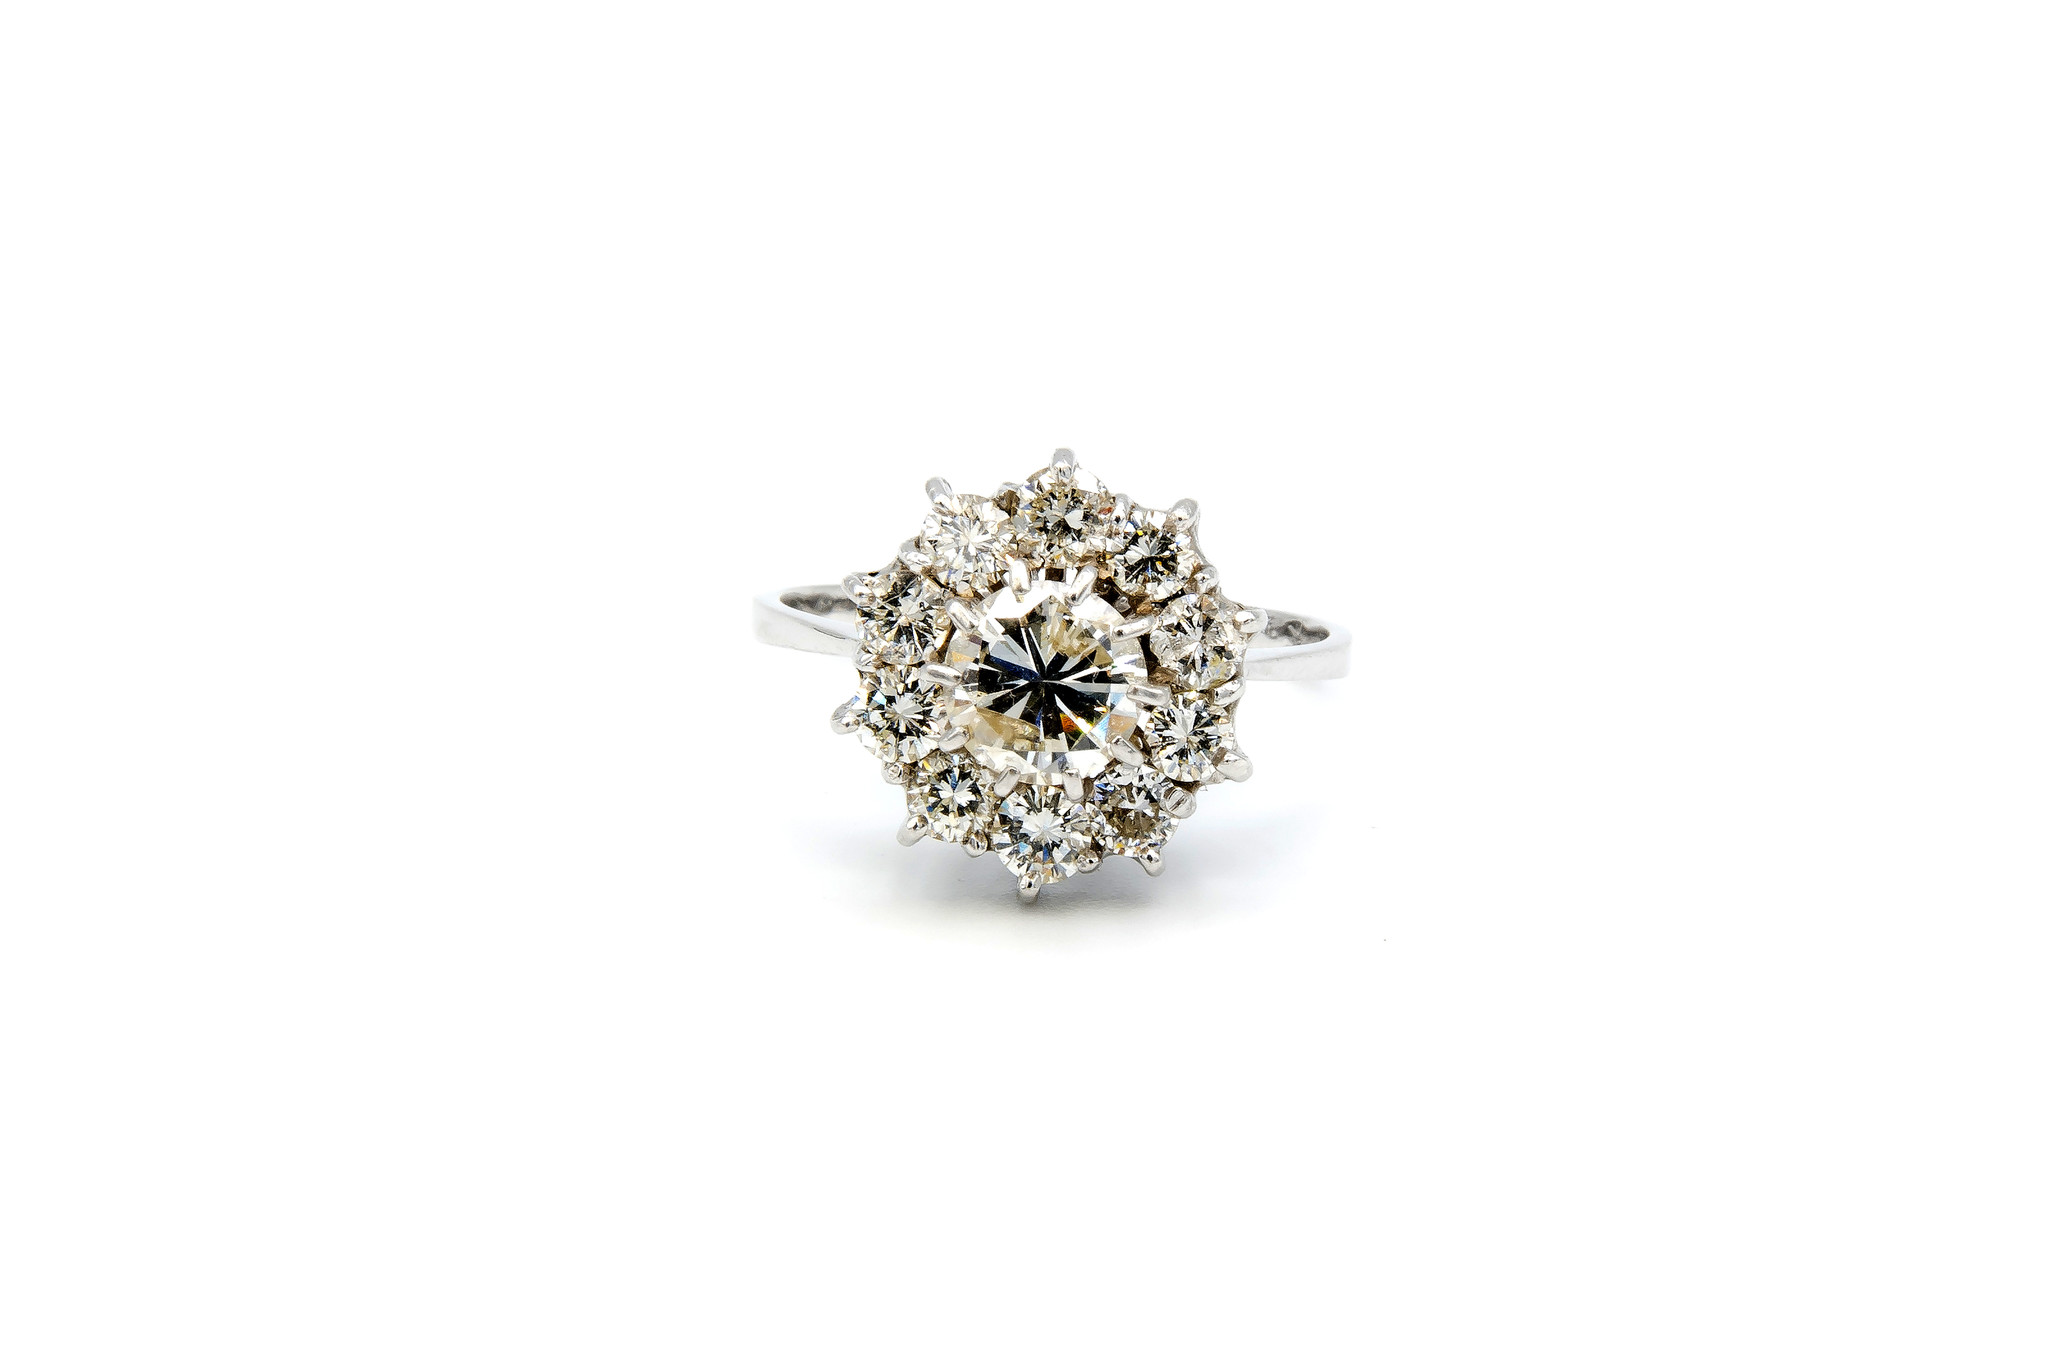 Ring verlovingsring grote synthetische diamant omringd door 10 lager ingezette diamanten witgoud-1